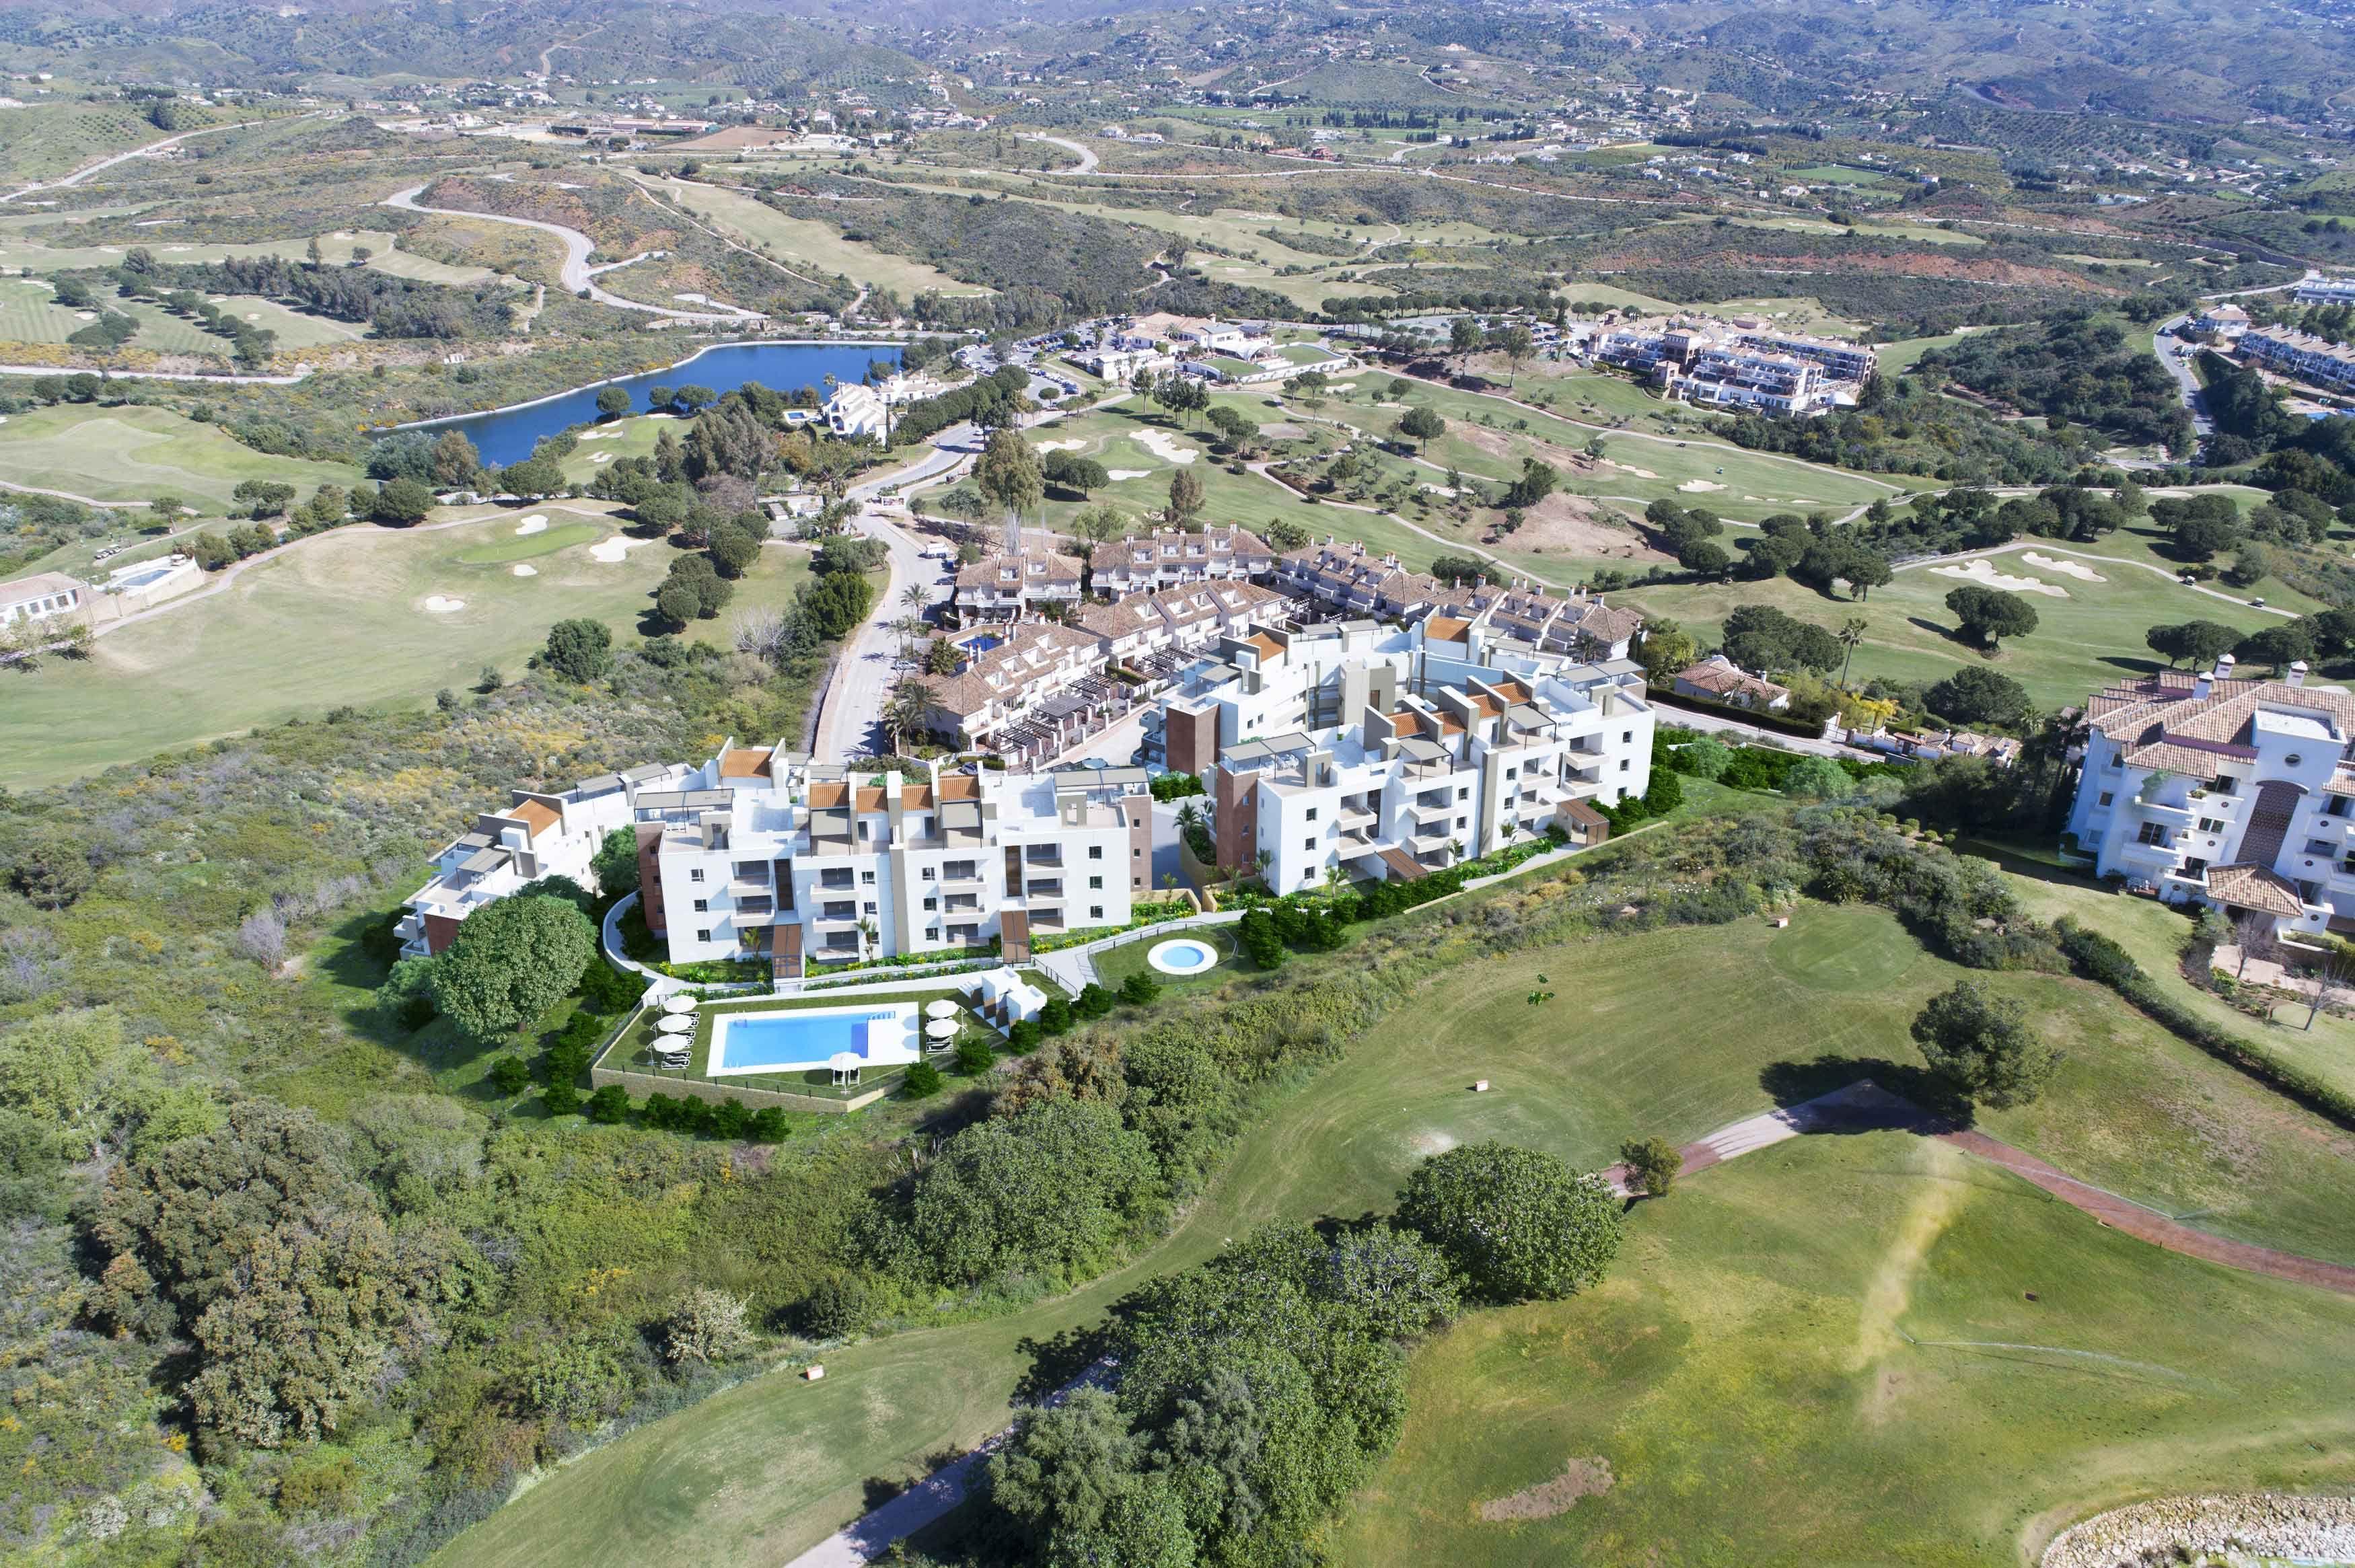 Grand View La Cala Golf Resort Mijas Malaga Taylor Wimpey Golf Resort Resort Views